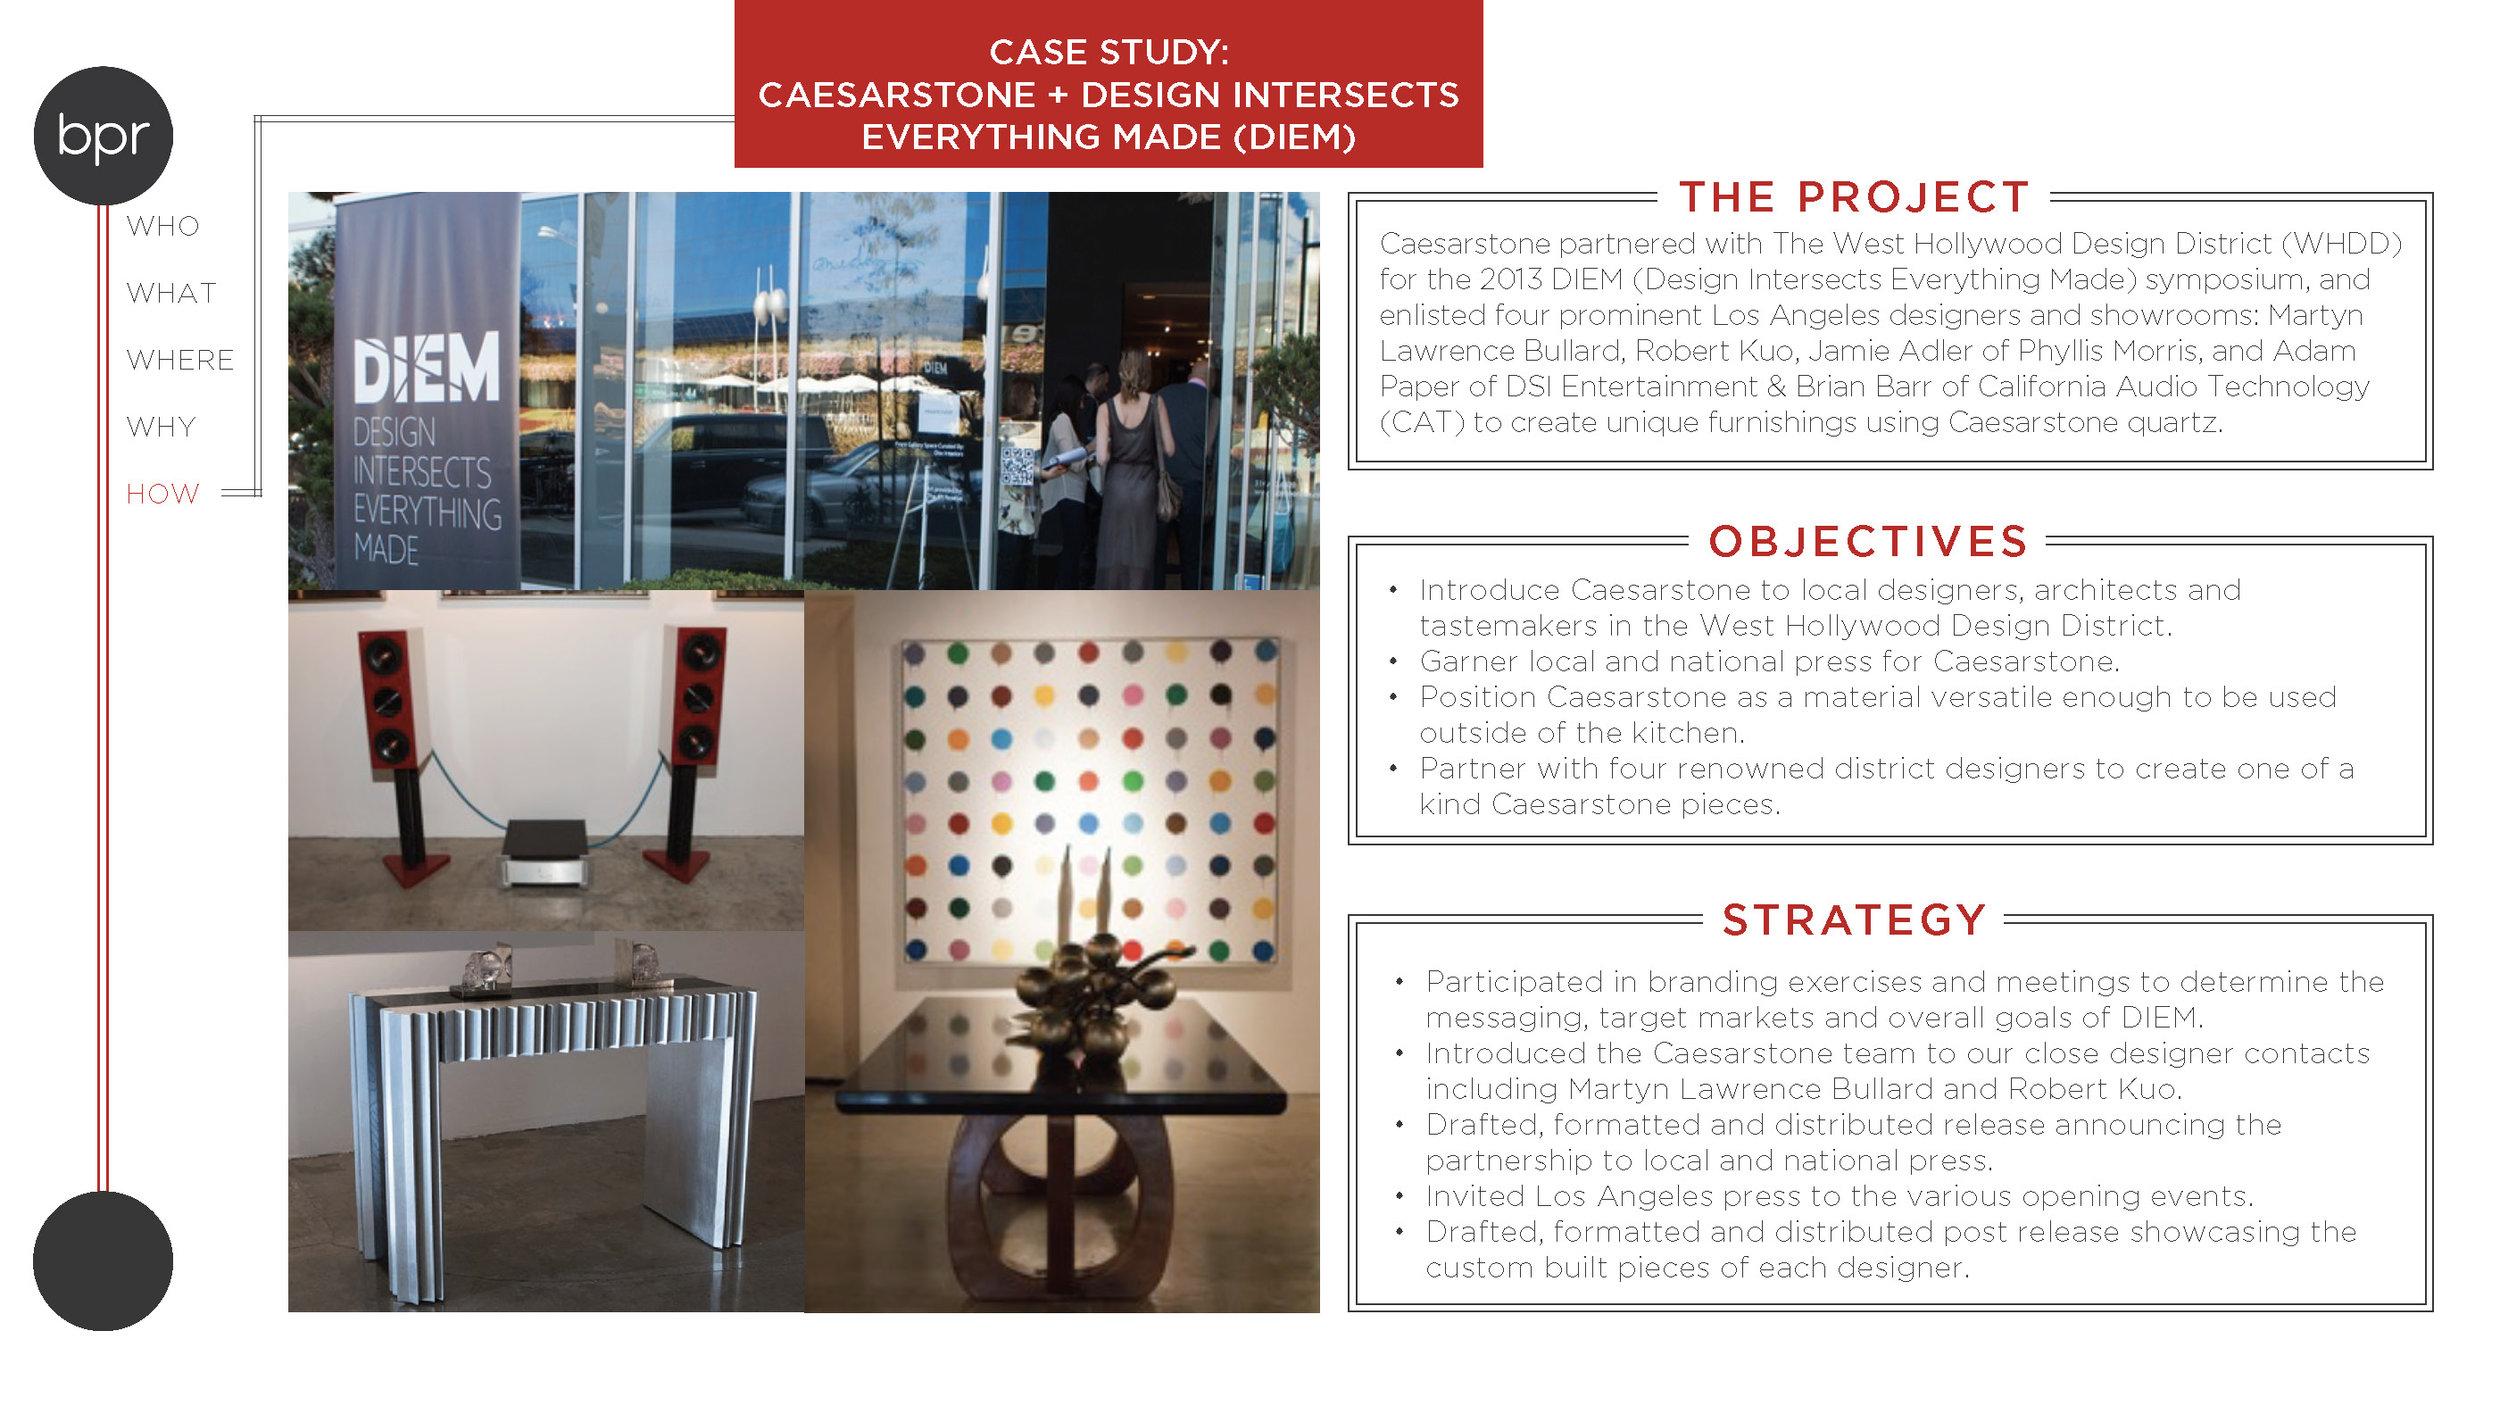 Caesarstone-Diem Case Study_Page_2.jpg